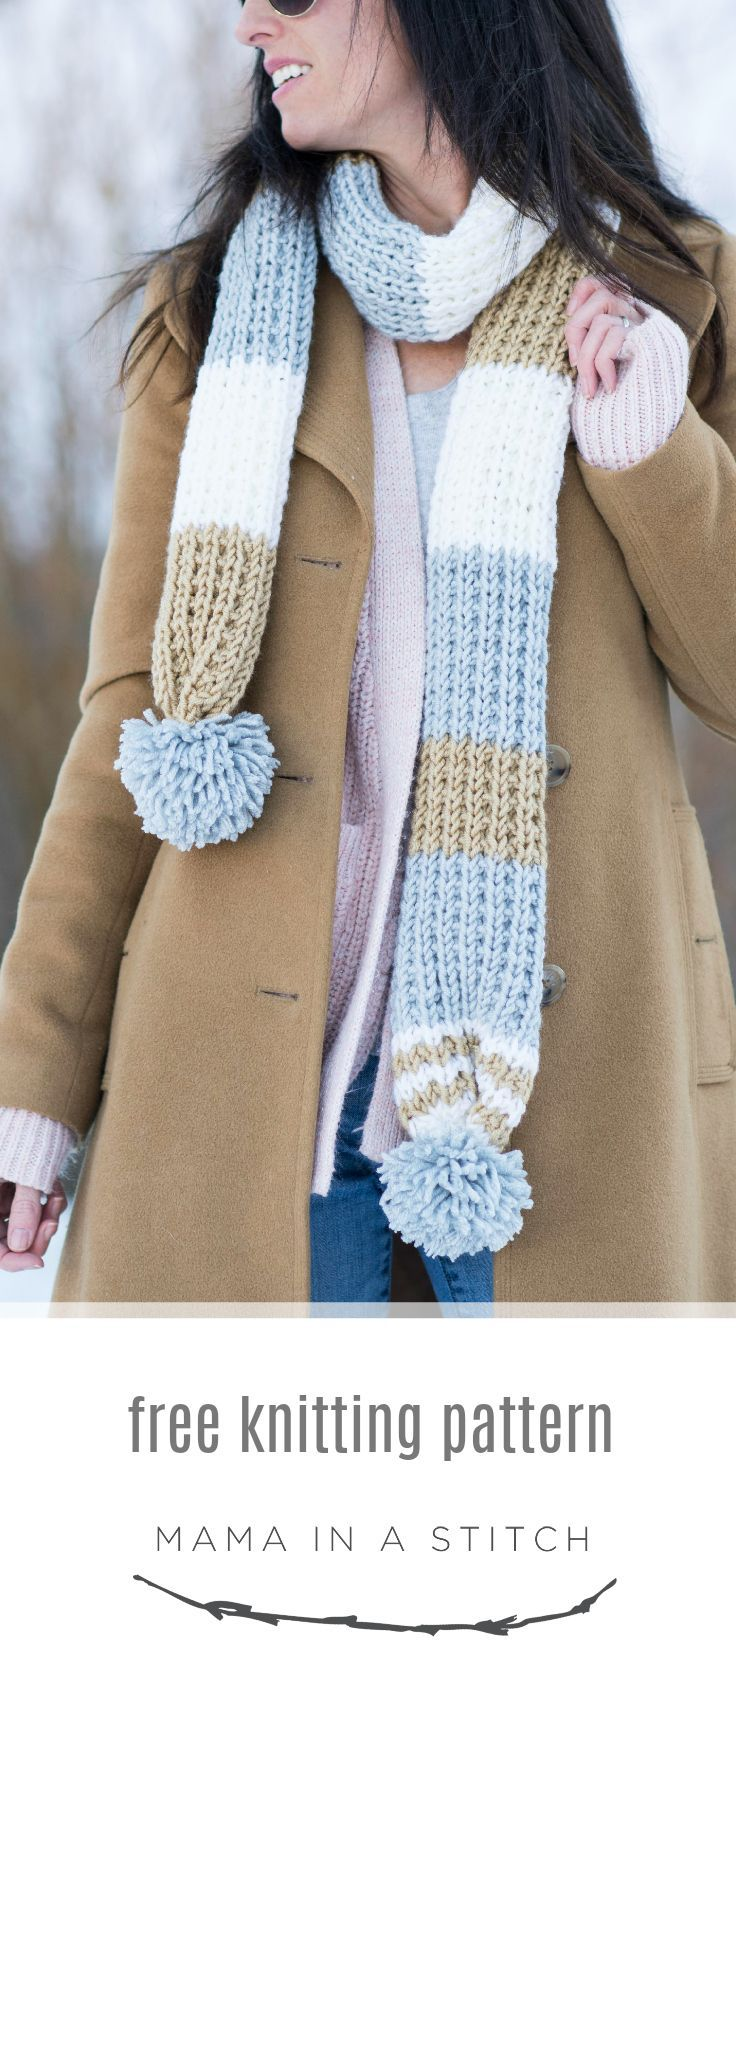 Photo of Fairbanks Pommed Knit Scarf Pattern